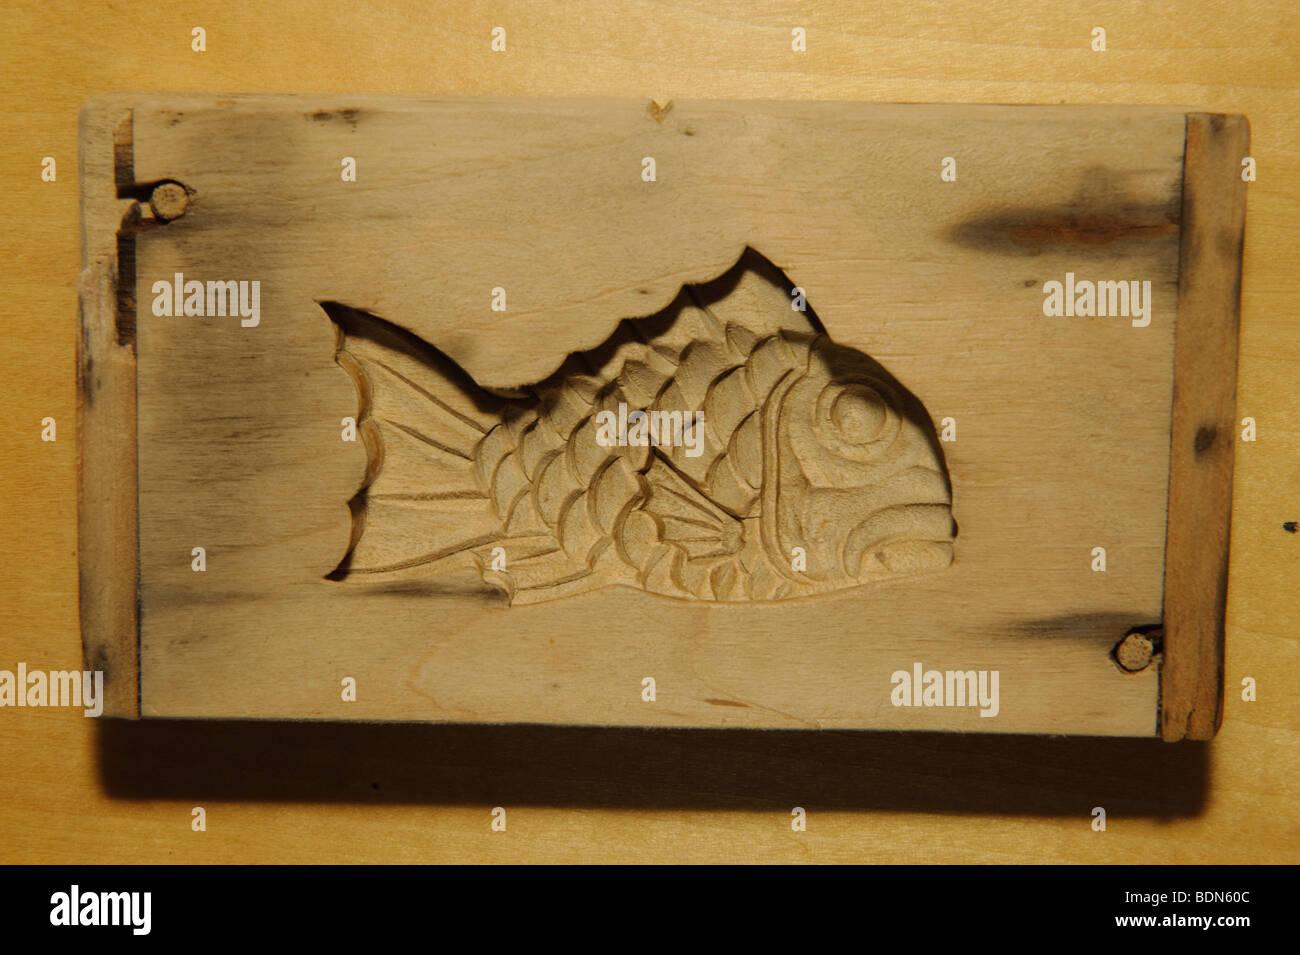 A wooden mold used to make kamaboko fish cake, Suzuhiro kamaboko, Odawara, Kanagawa prefecture, Japan, August 19, - Stock Image